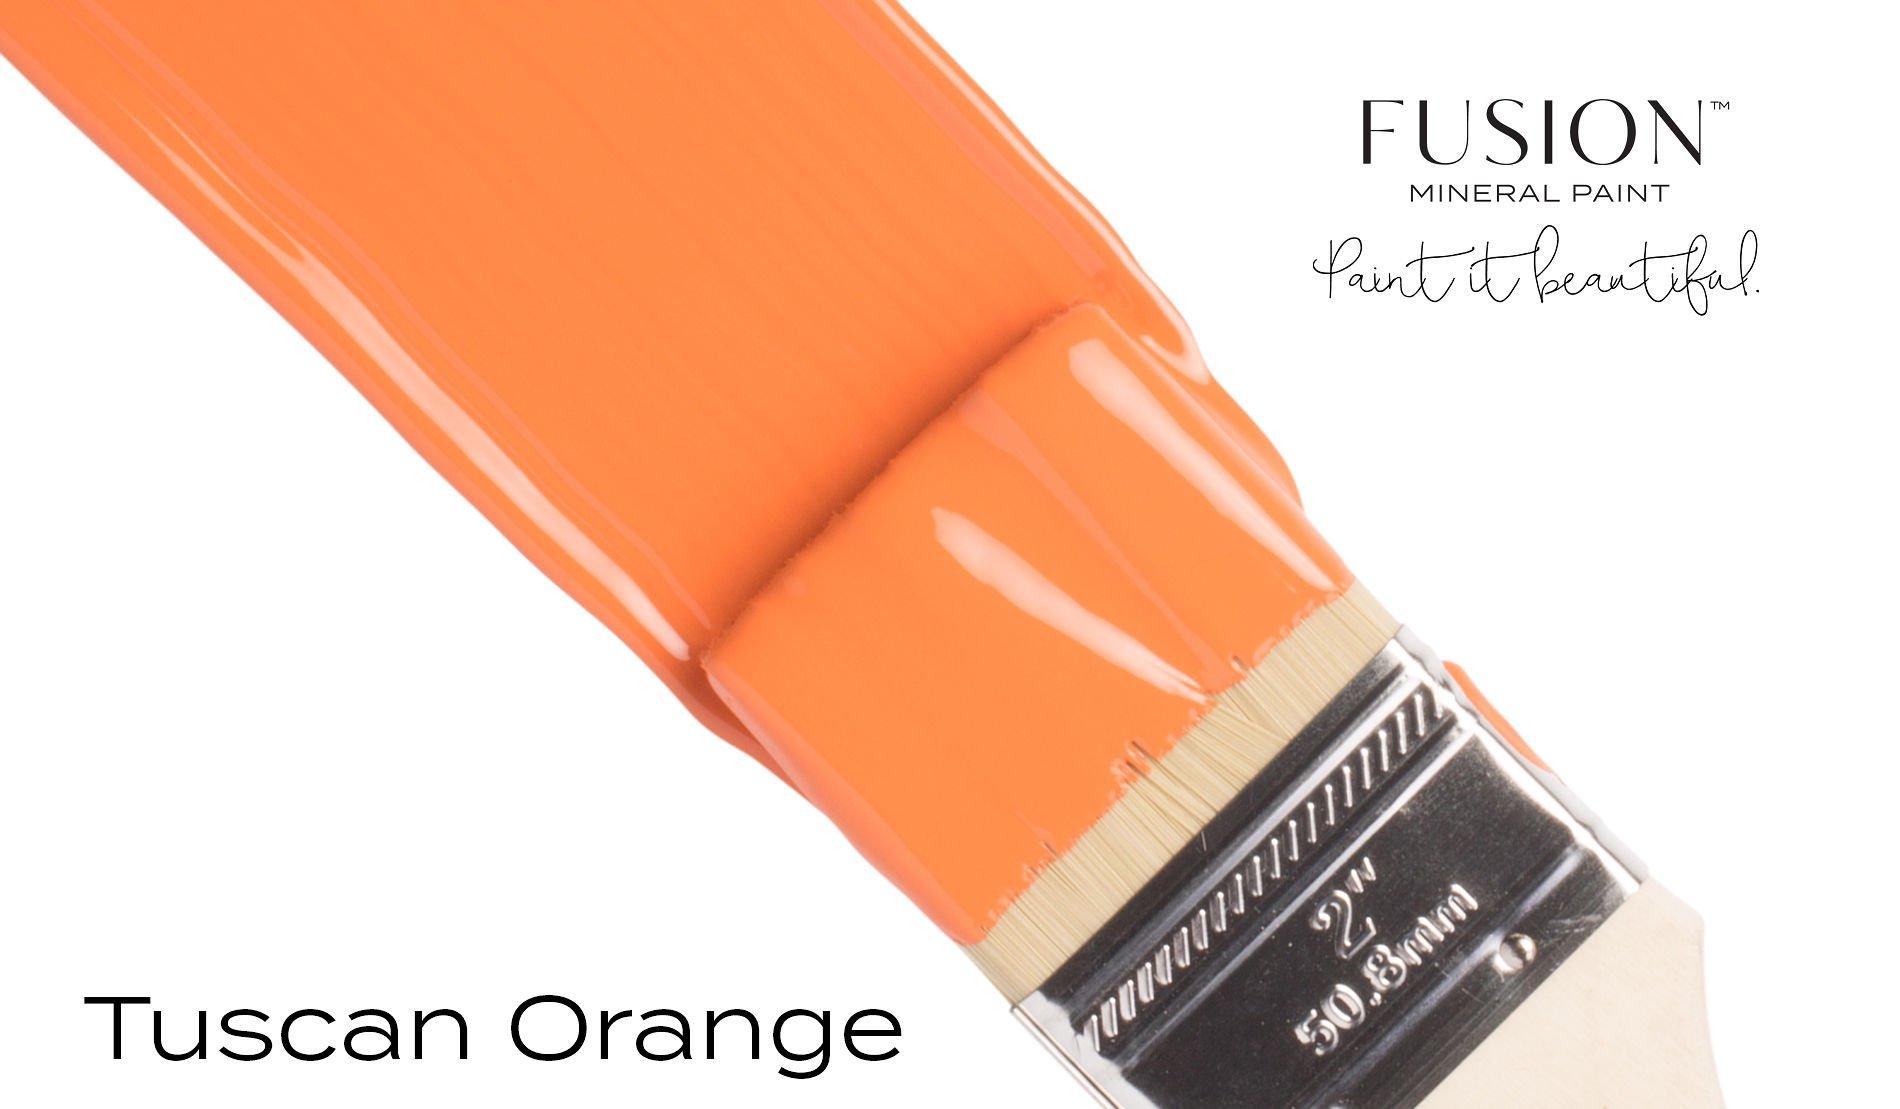 Fusion Mineral Paint Brushstroke - Tuscan Orange | www.raggedy-bits.com